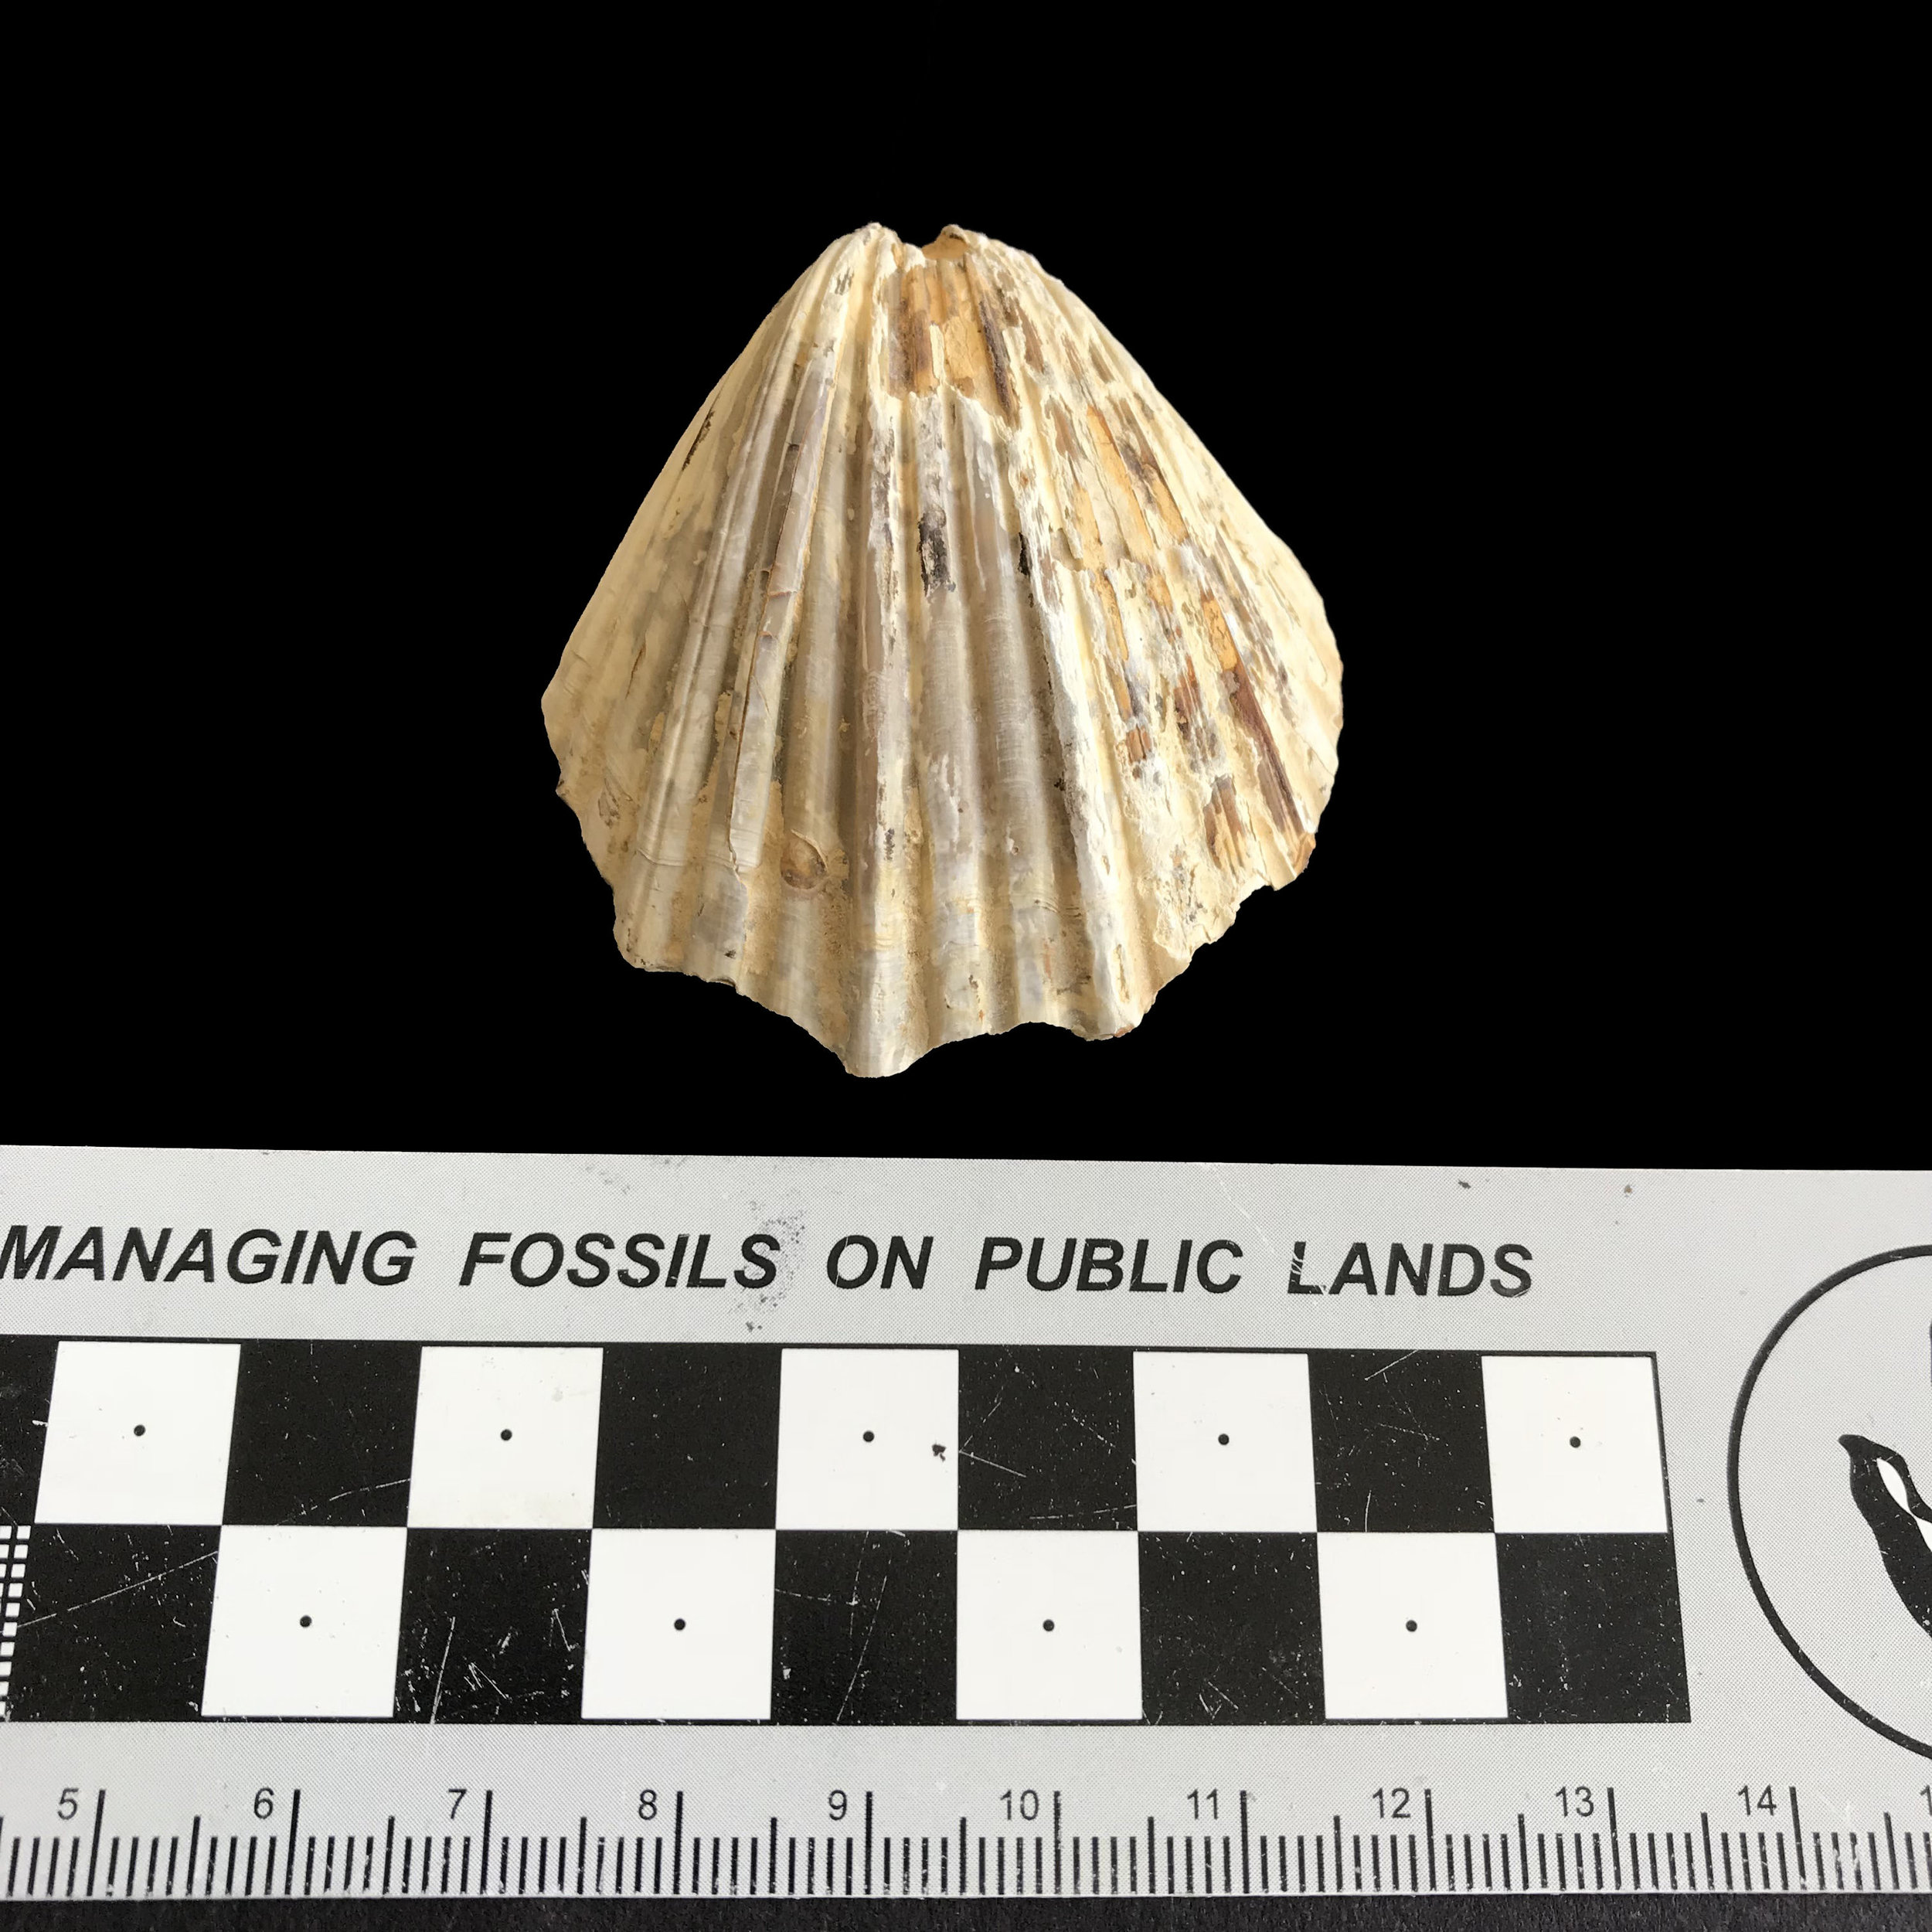 Neithia #1132  Grayson Marl Formation  Denton Co., TX